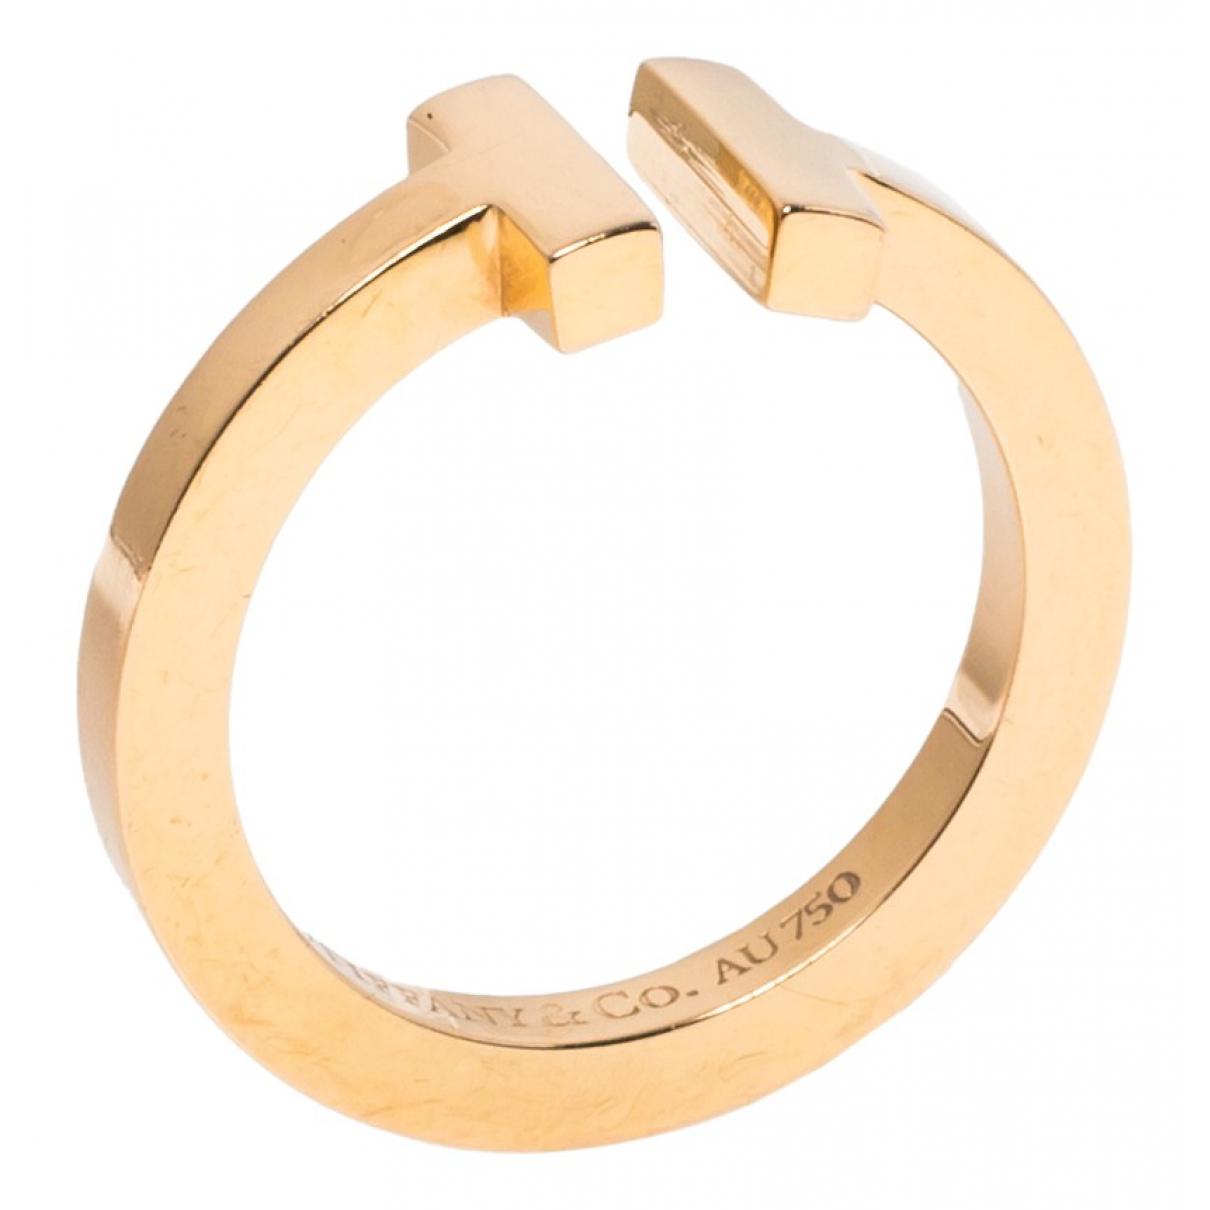 Tiffany & Co - Bague Tiffany T pour femme en or rose